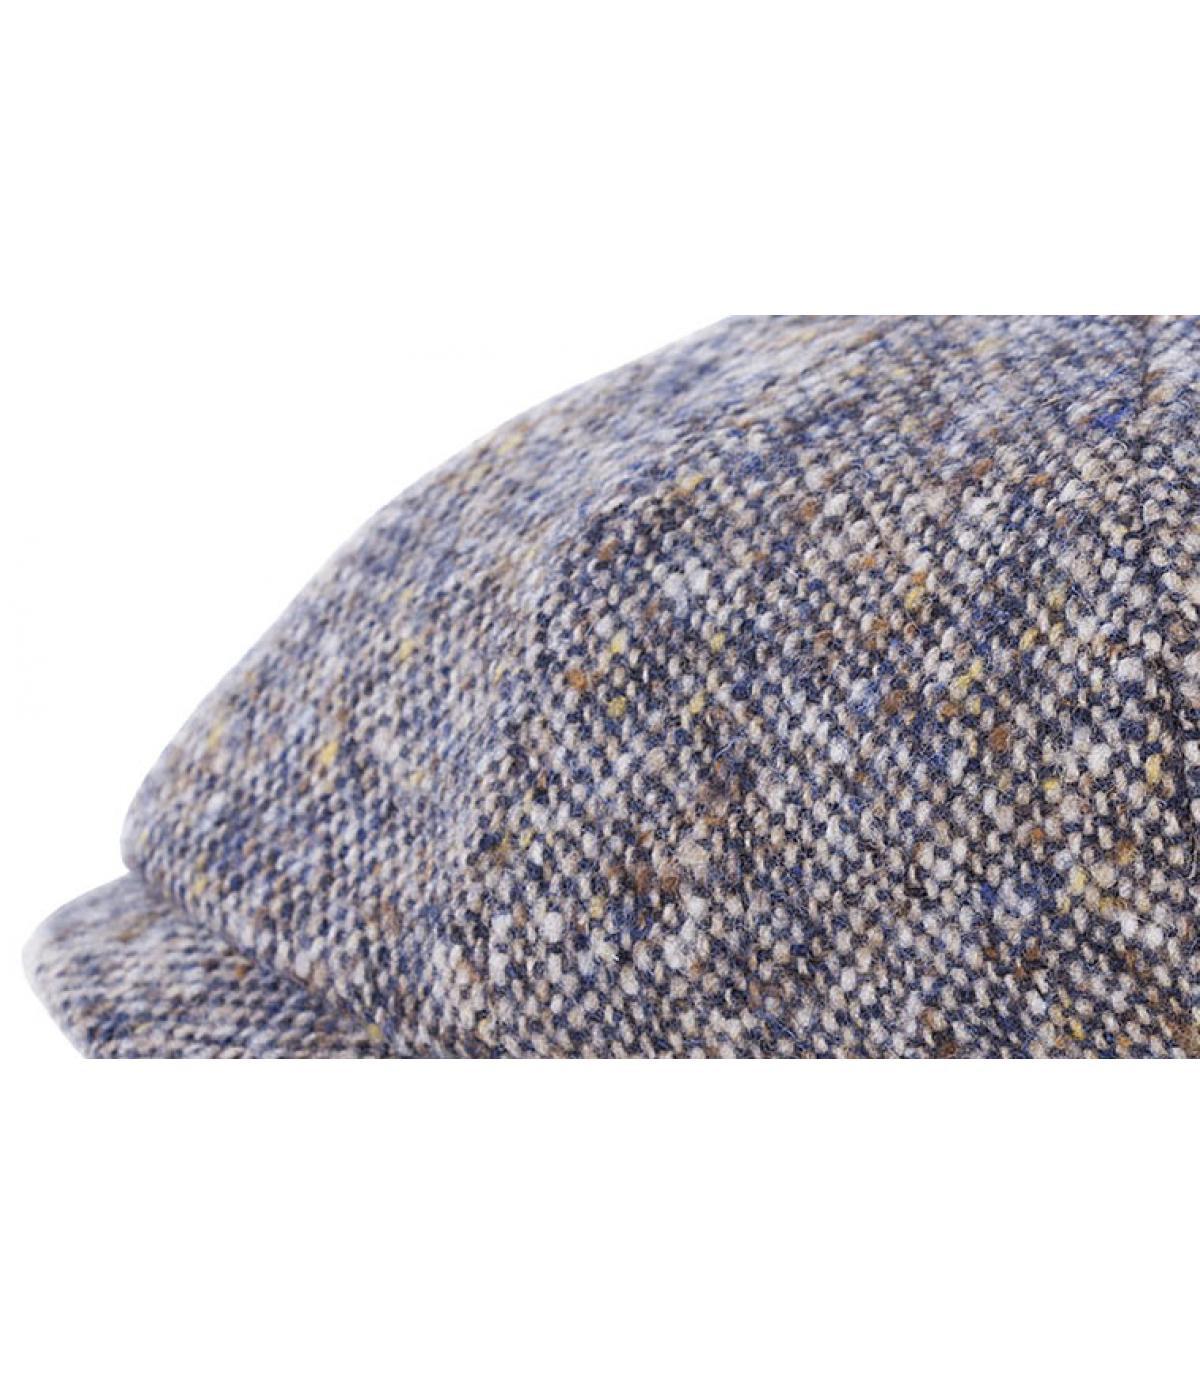 Detalles Hatteras donegal laine azul imagen 2